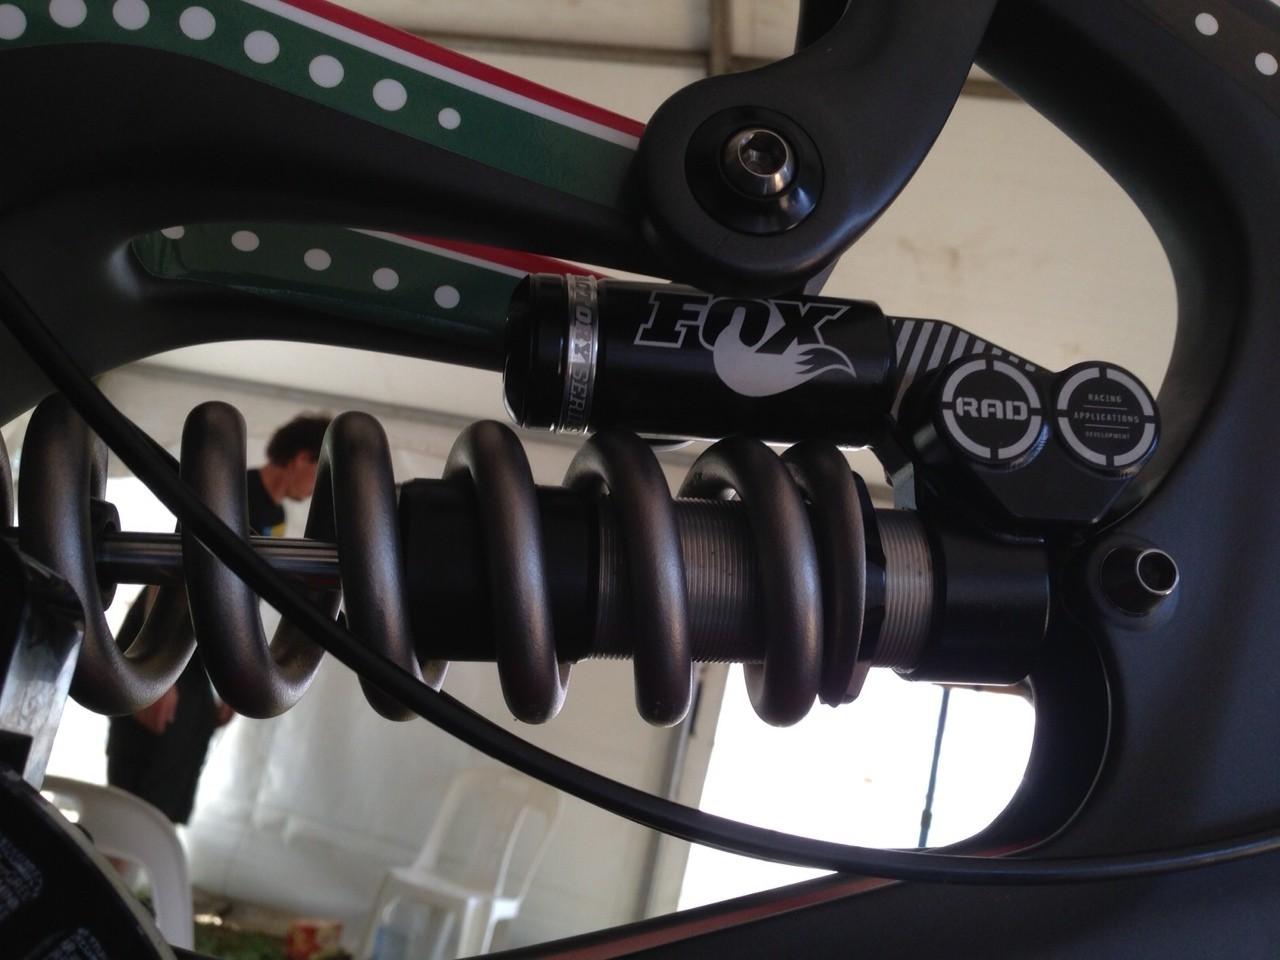 Prototype Fox RAD Coil Shock on Greg Minnaar's World Champs Bike - World Championships Bikes and Gear 2013 - Mountain Biking Pictures - Vital MTB